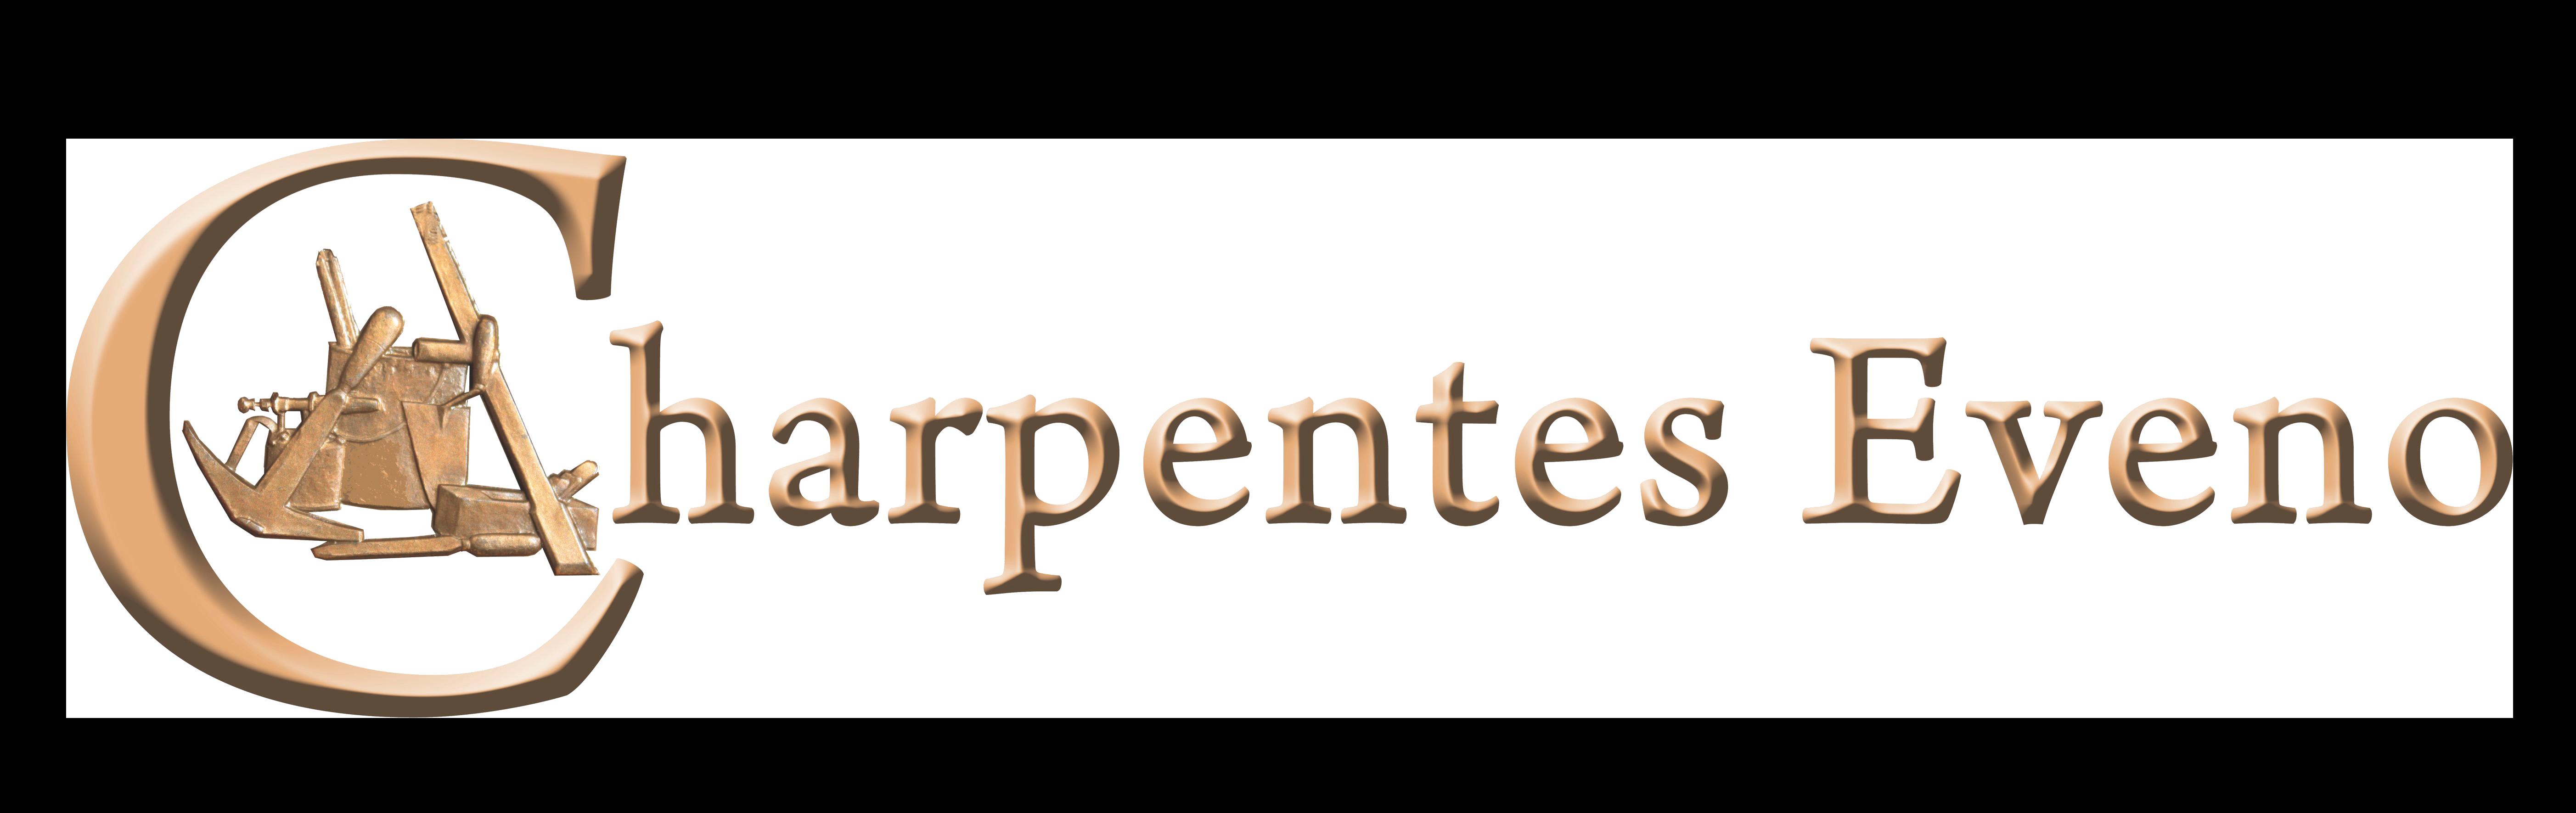 Logo de l'entreprise Charpentes Eveno